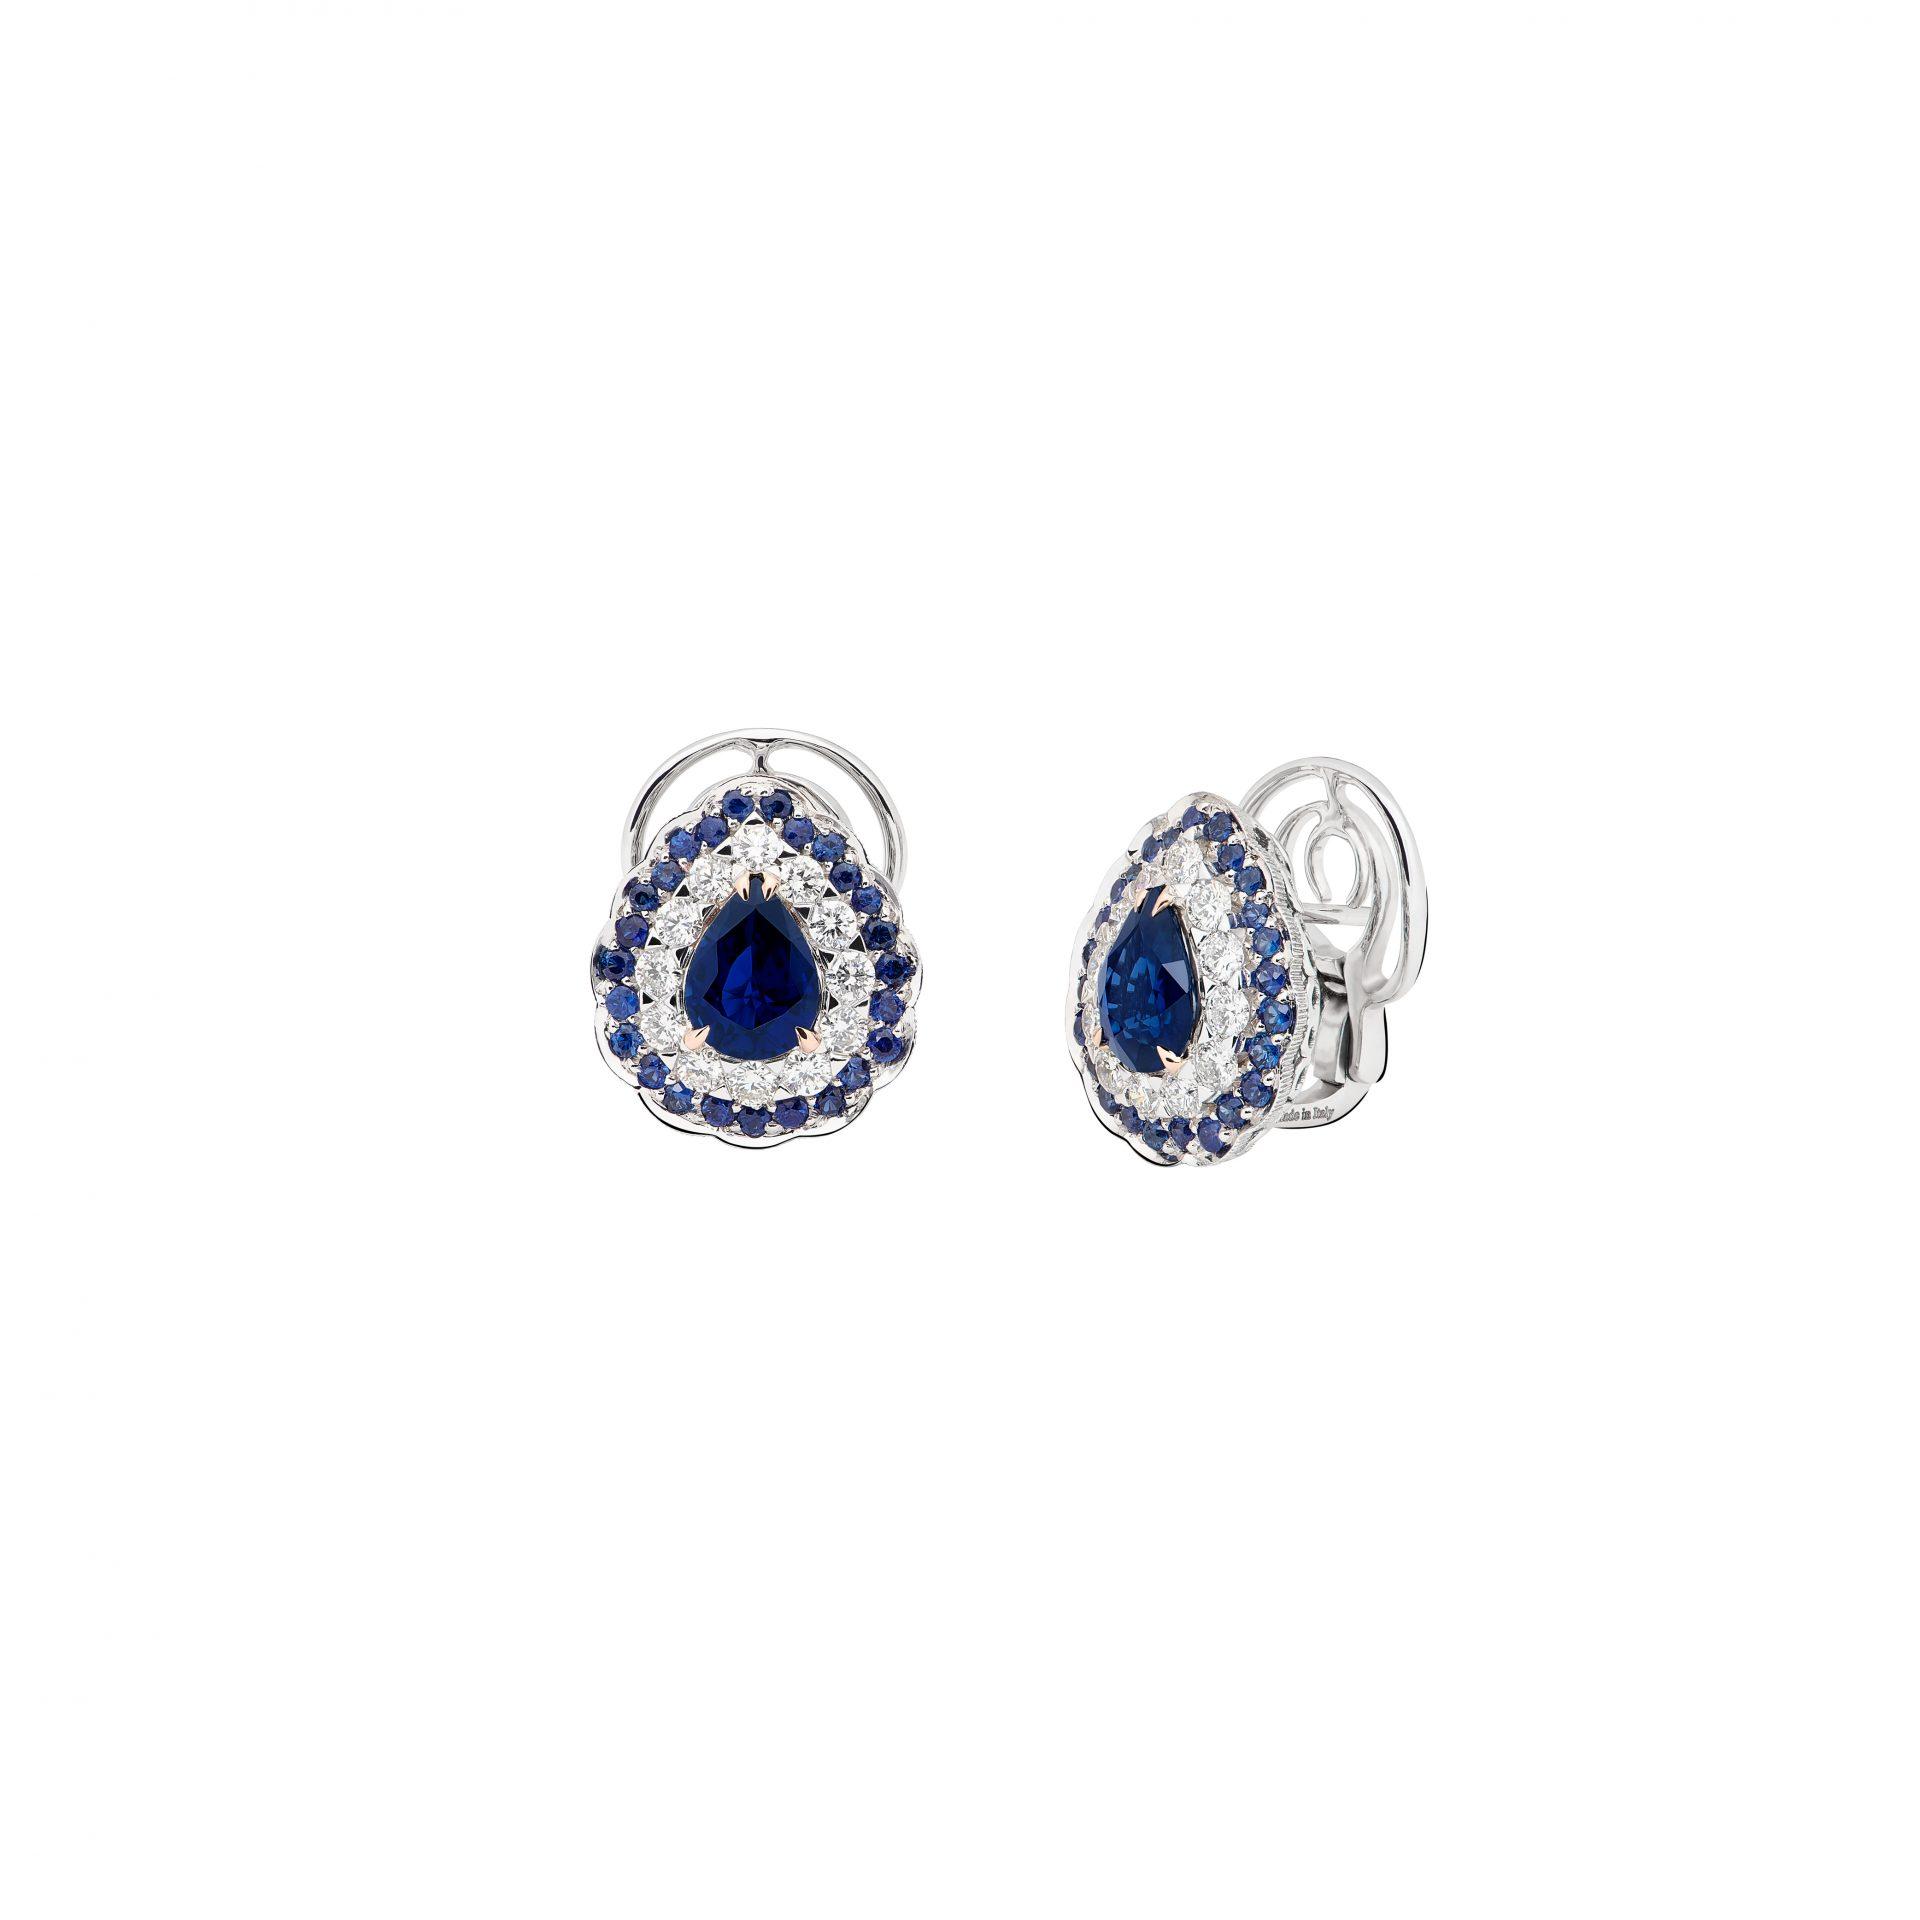 La Broderie Bleue Earrings